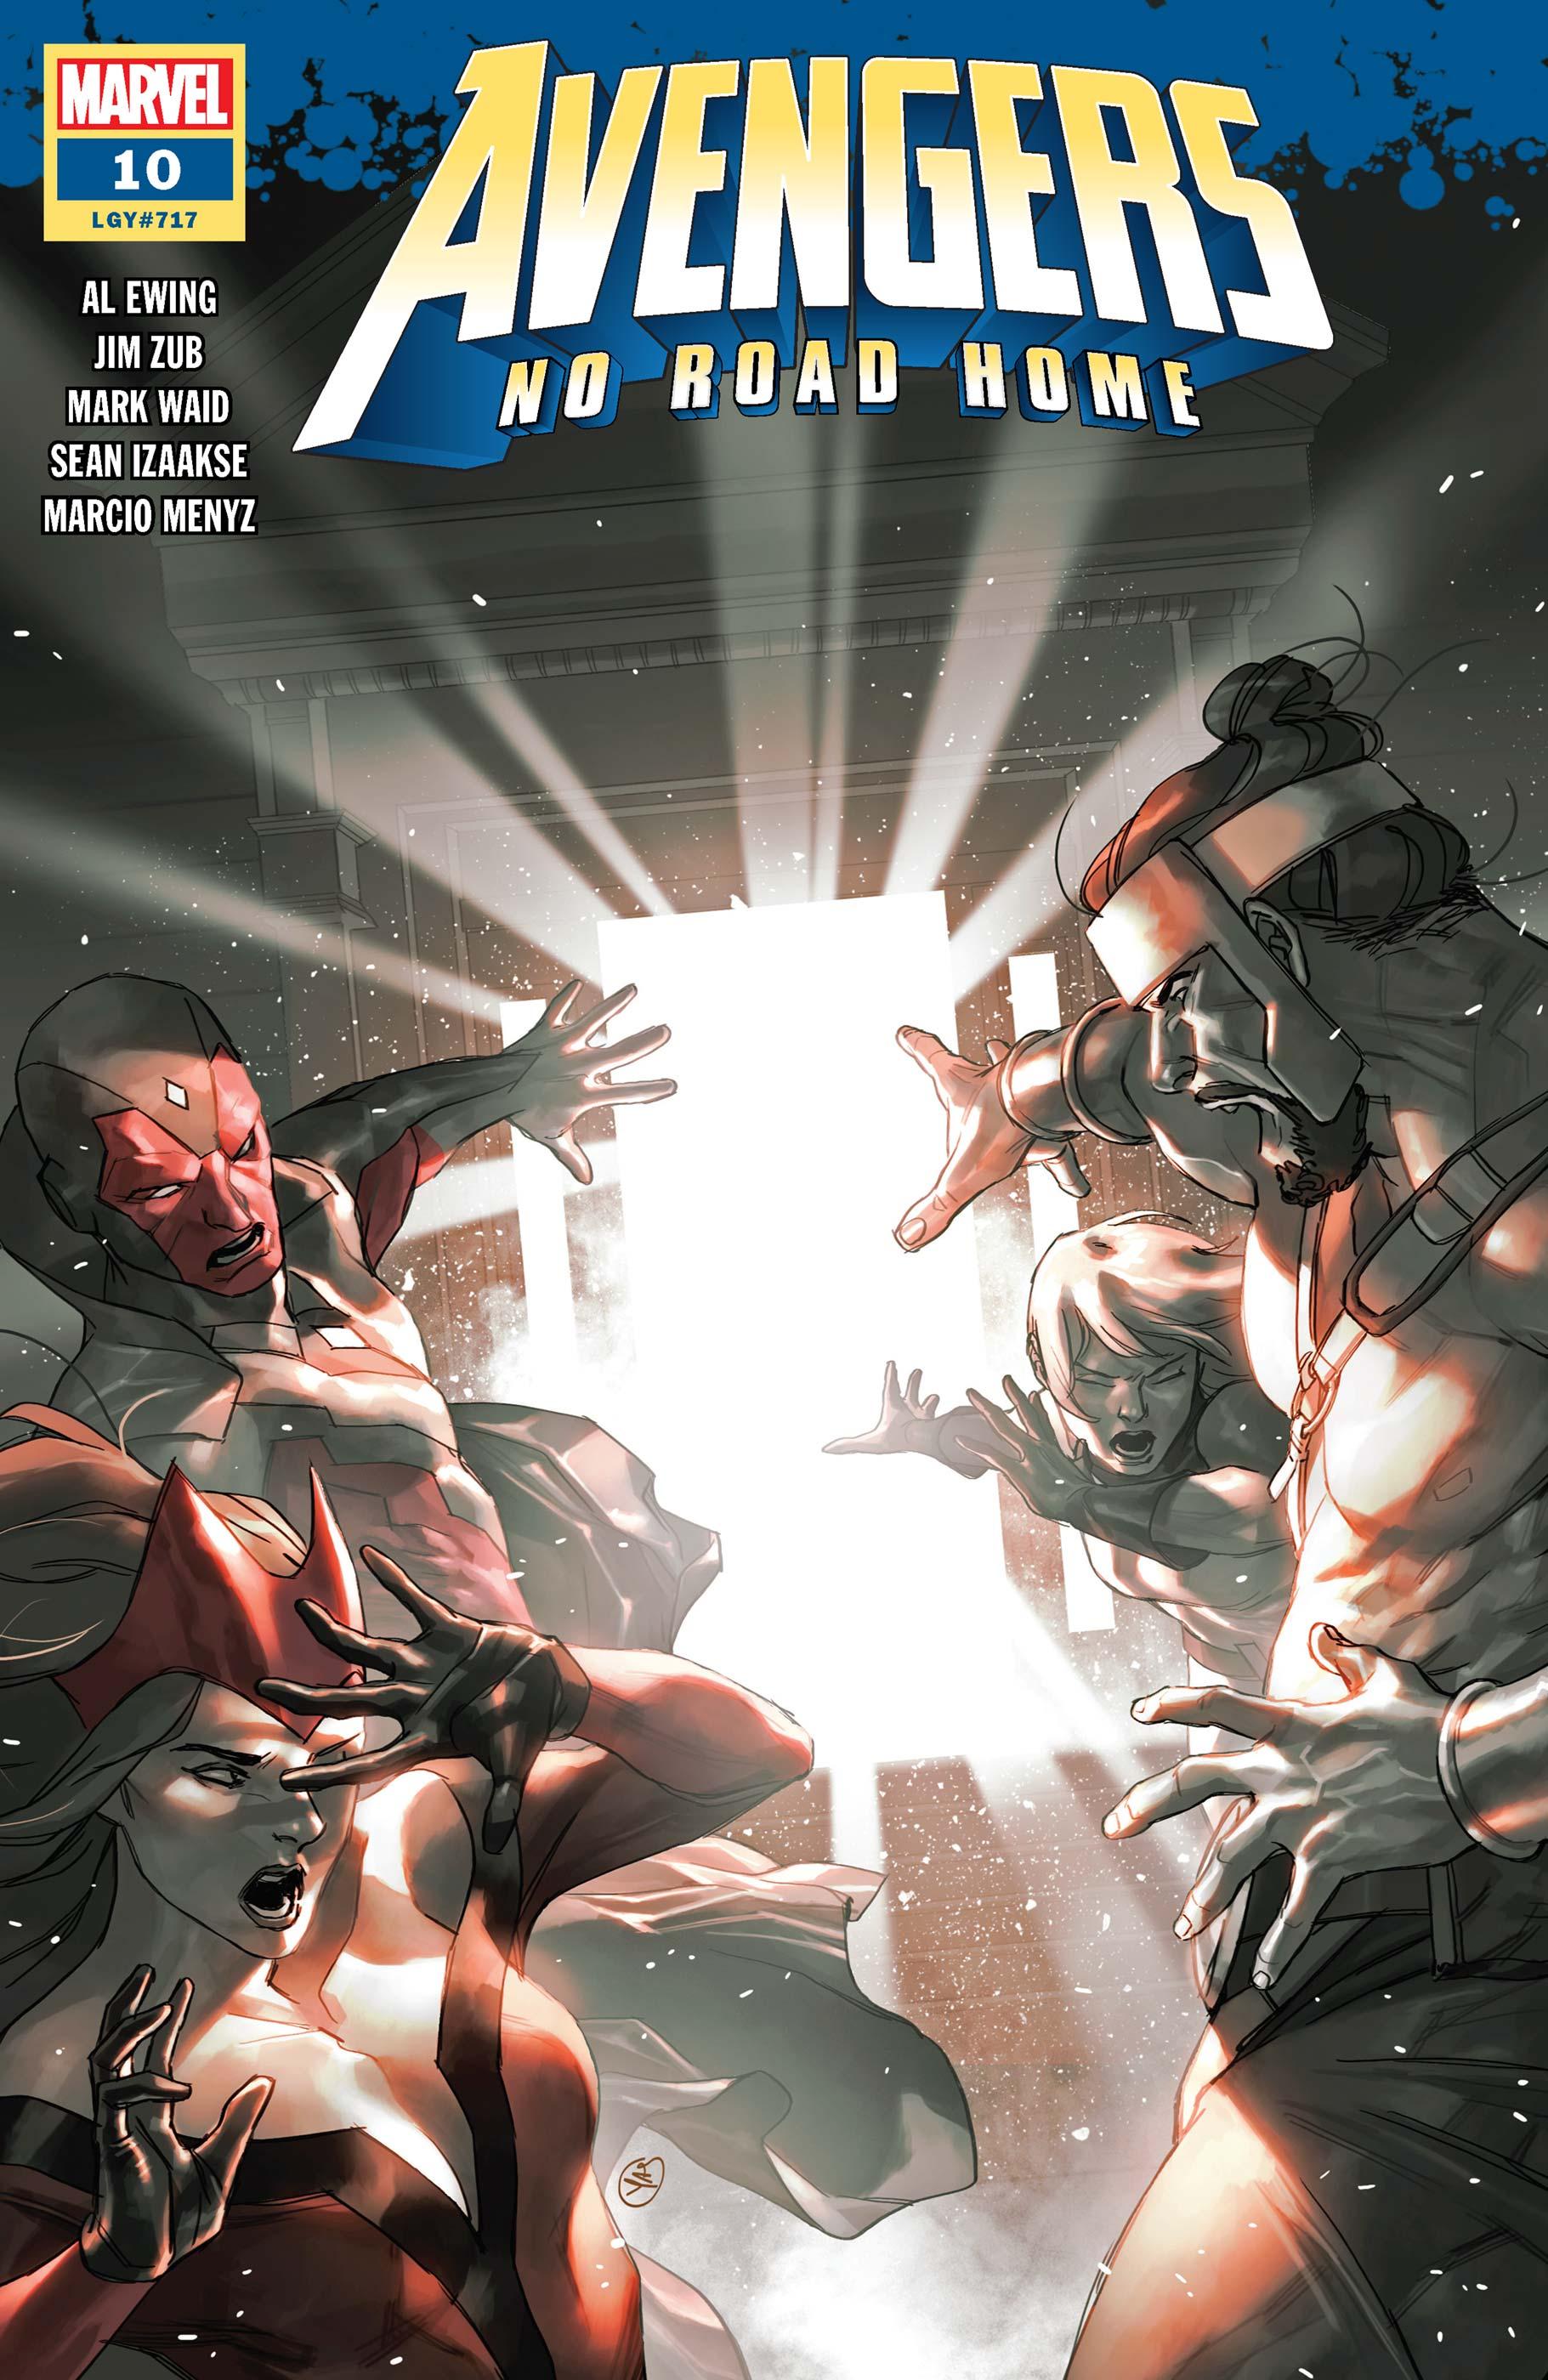 Avengers No Road Home (2019) #10